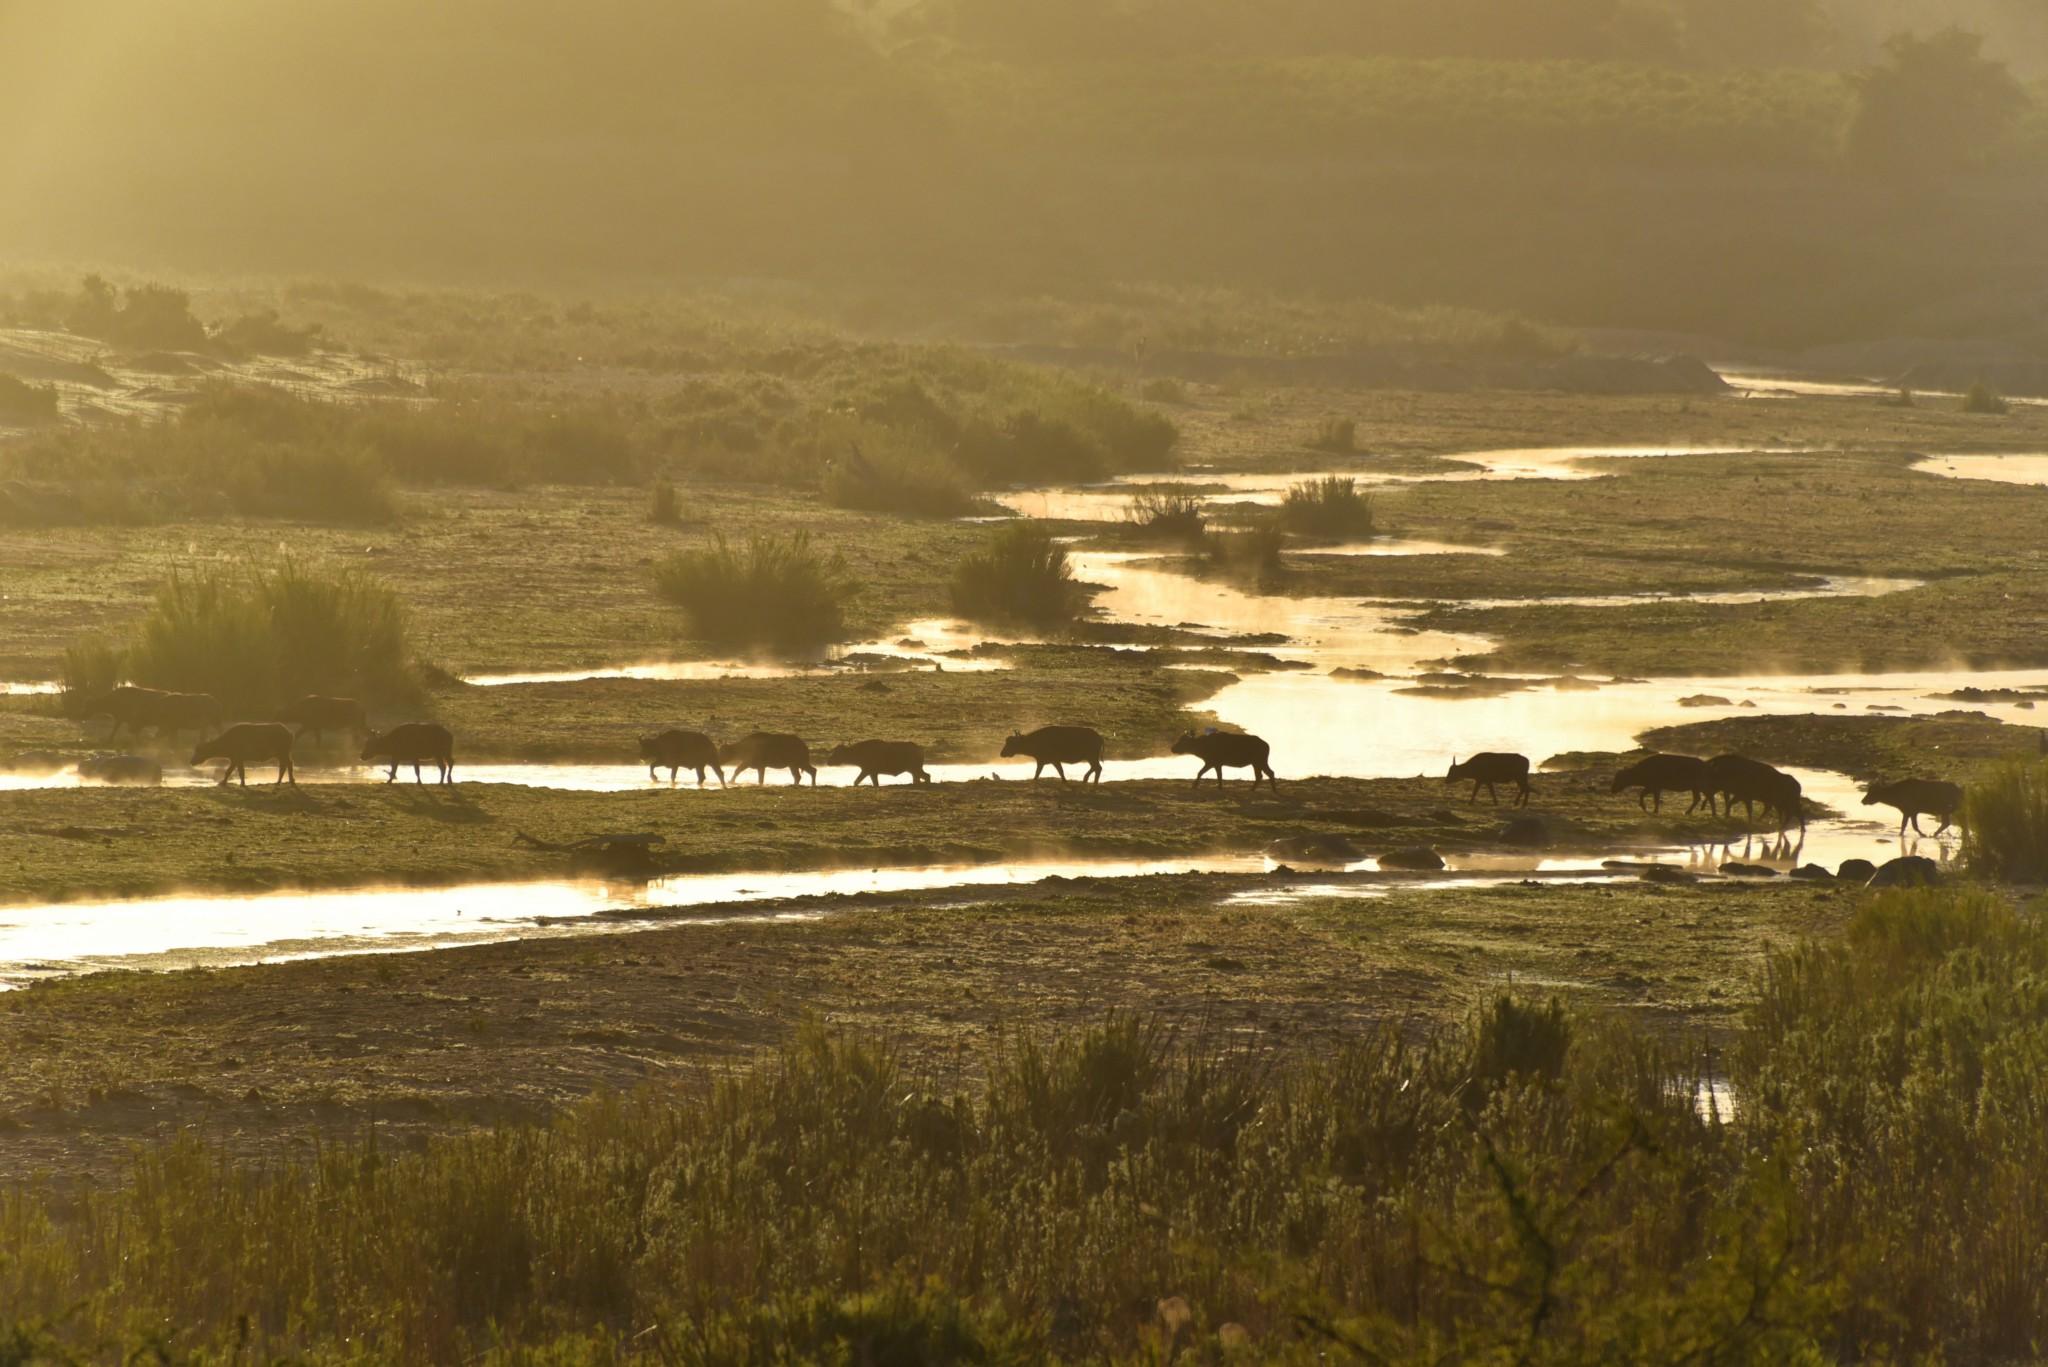 Komatiepoort - Crocodile River